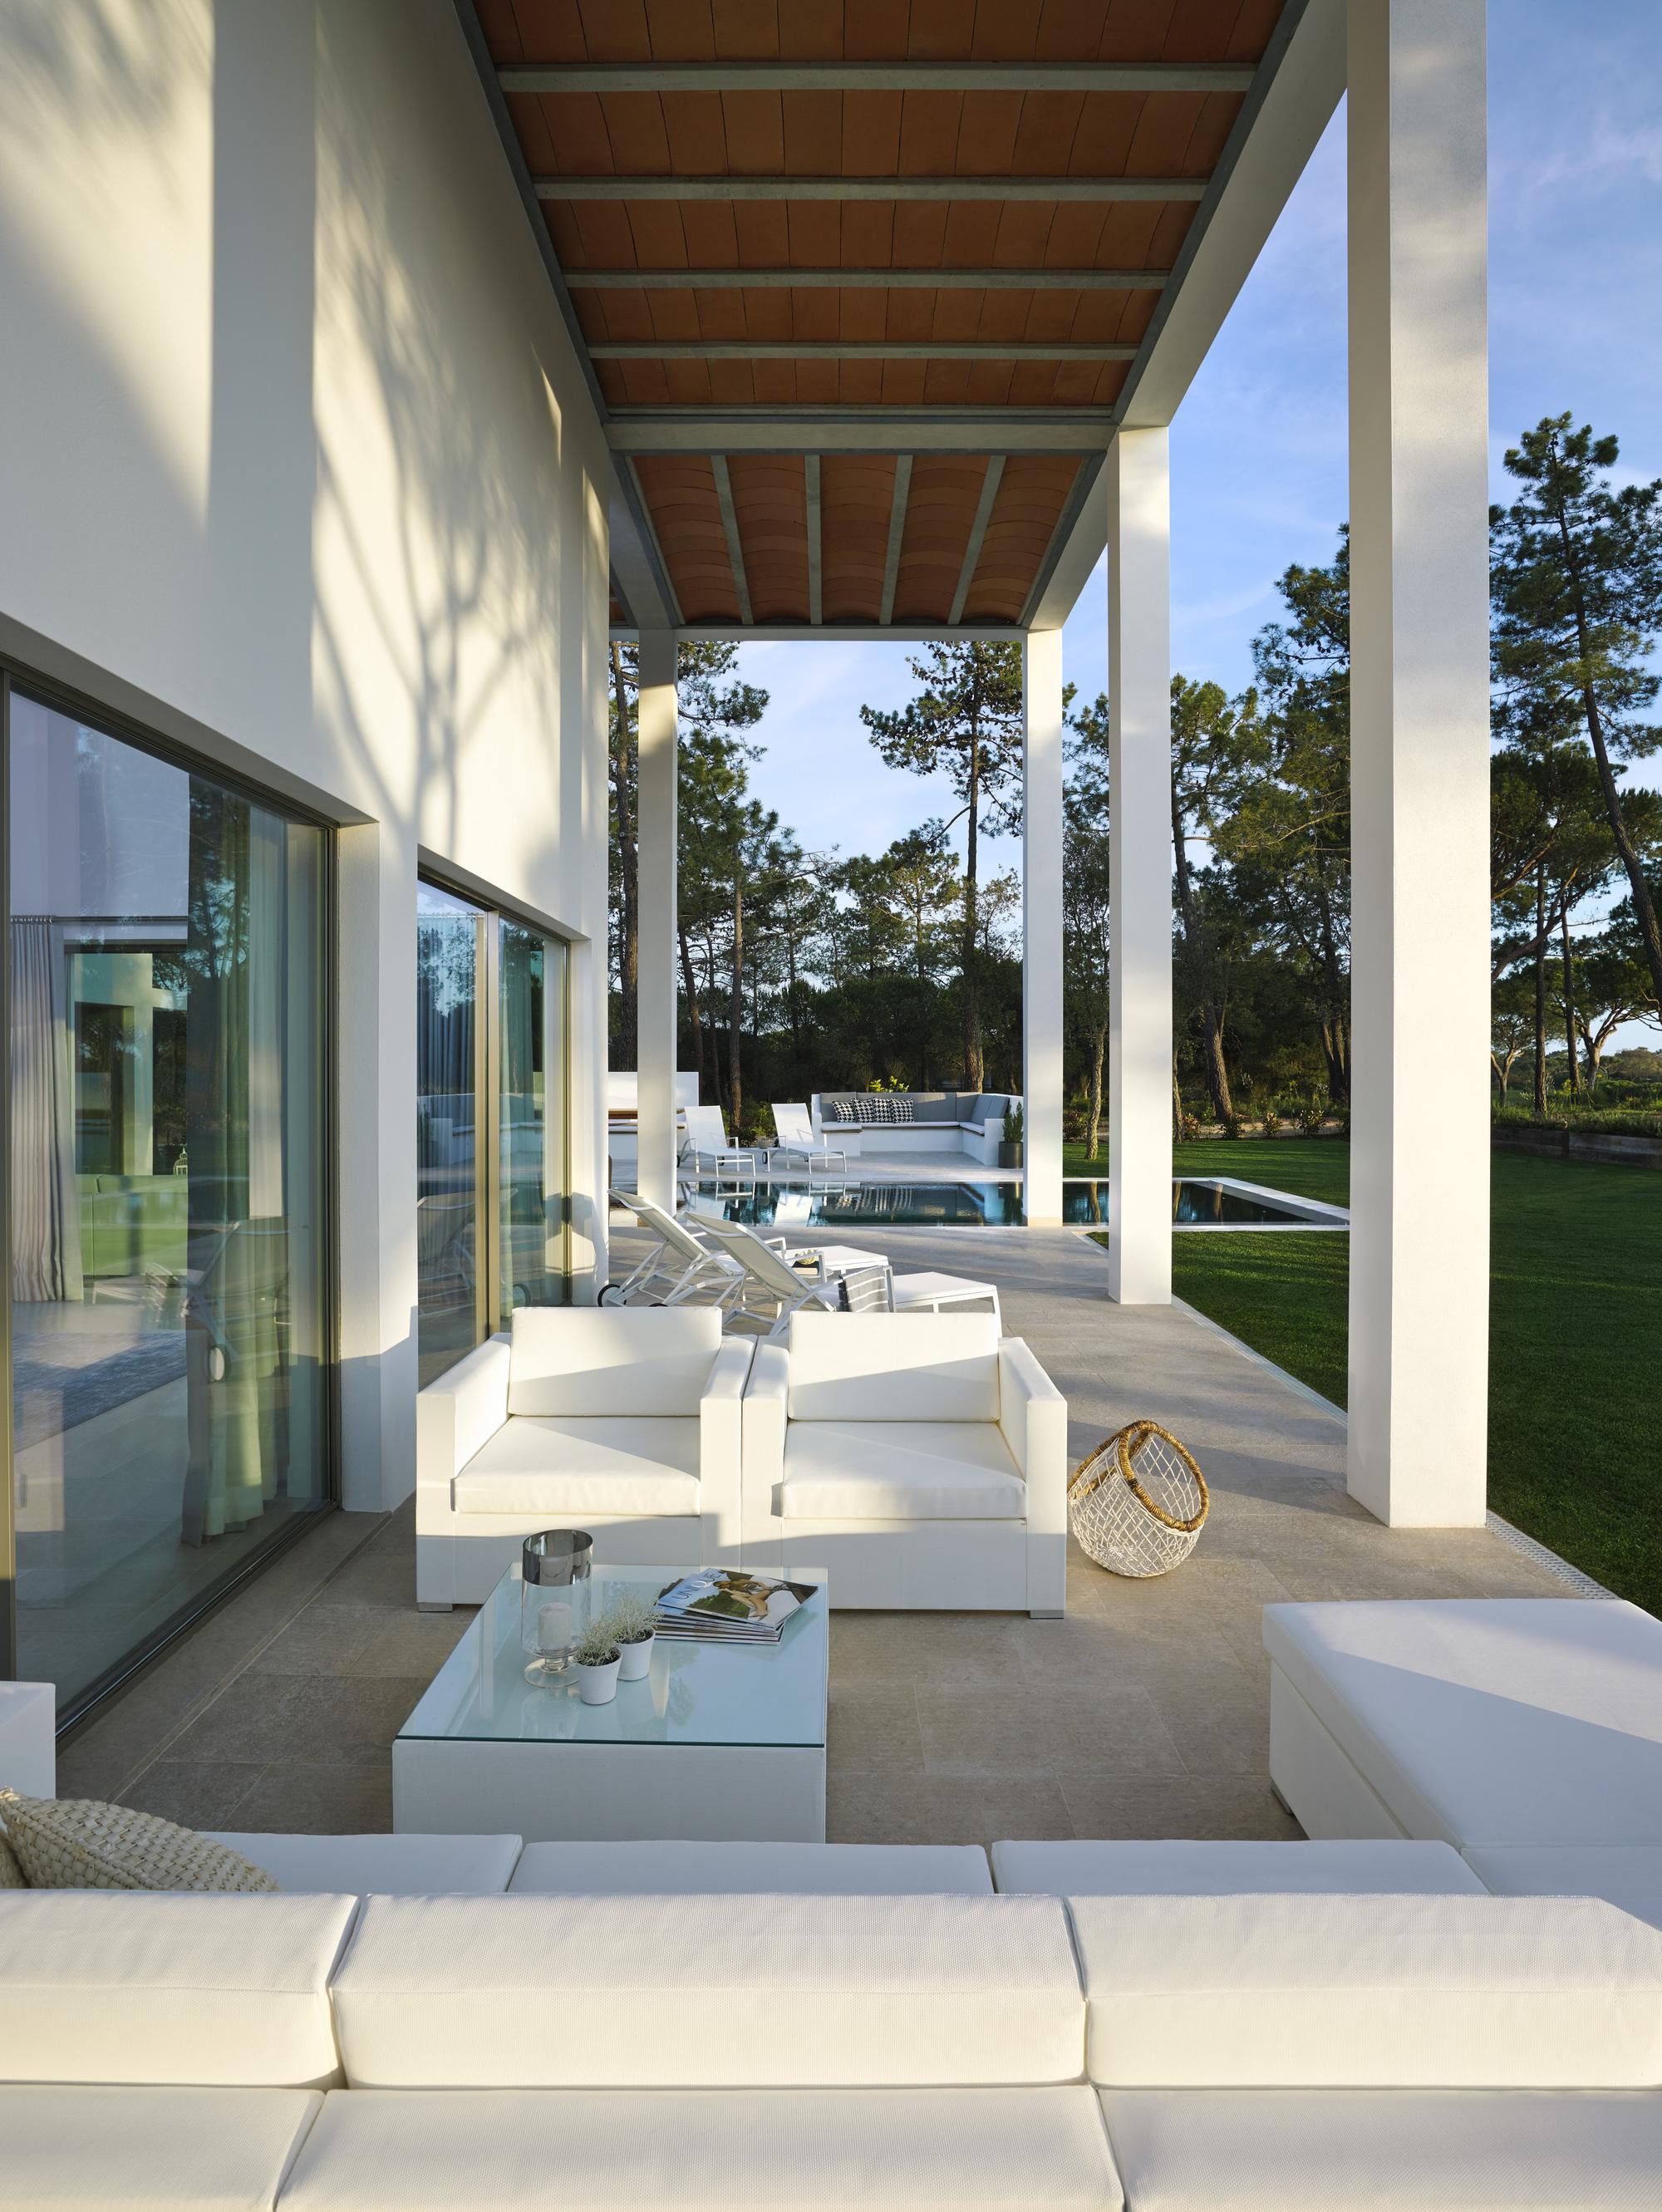 520a3825e8e44e80d100004e_san-lorenzo-house-de-blacam-and-meagher-architects_sln_4.jpg